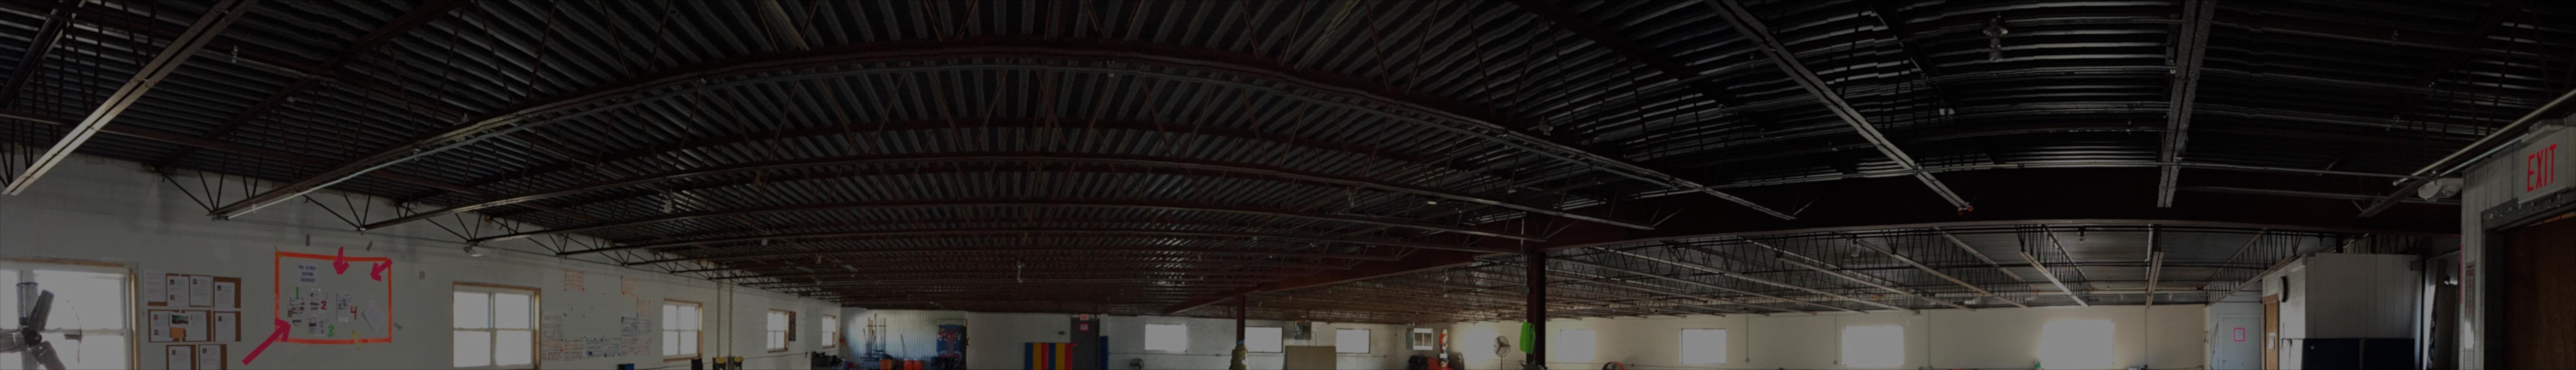 360 Industrial Supply Wholesale Electrical Company Best To Identify Zinsco Gte Sylvaniazinsco Panels Circuit Slide Background